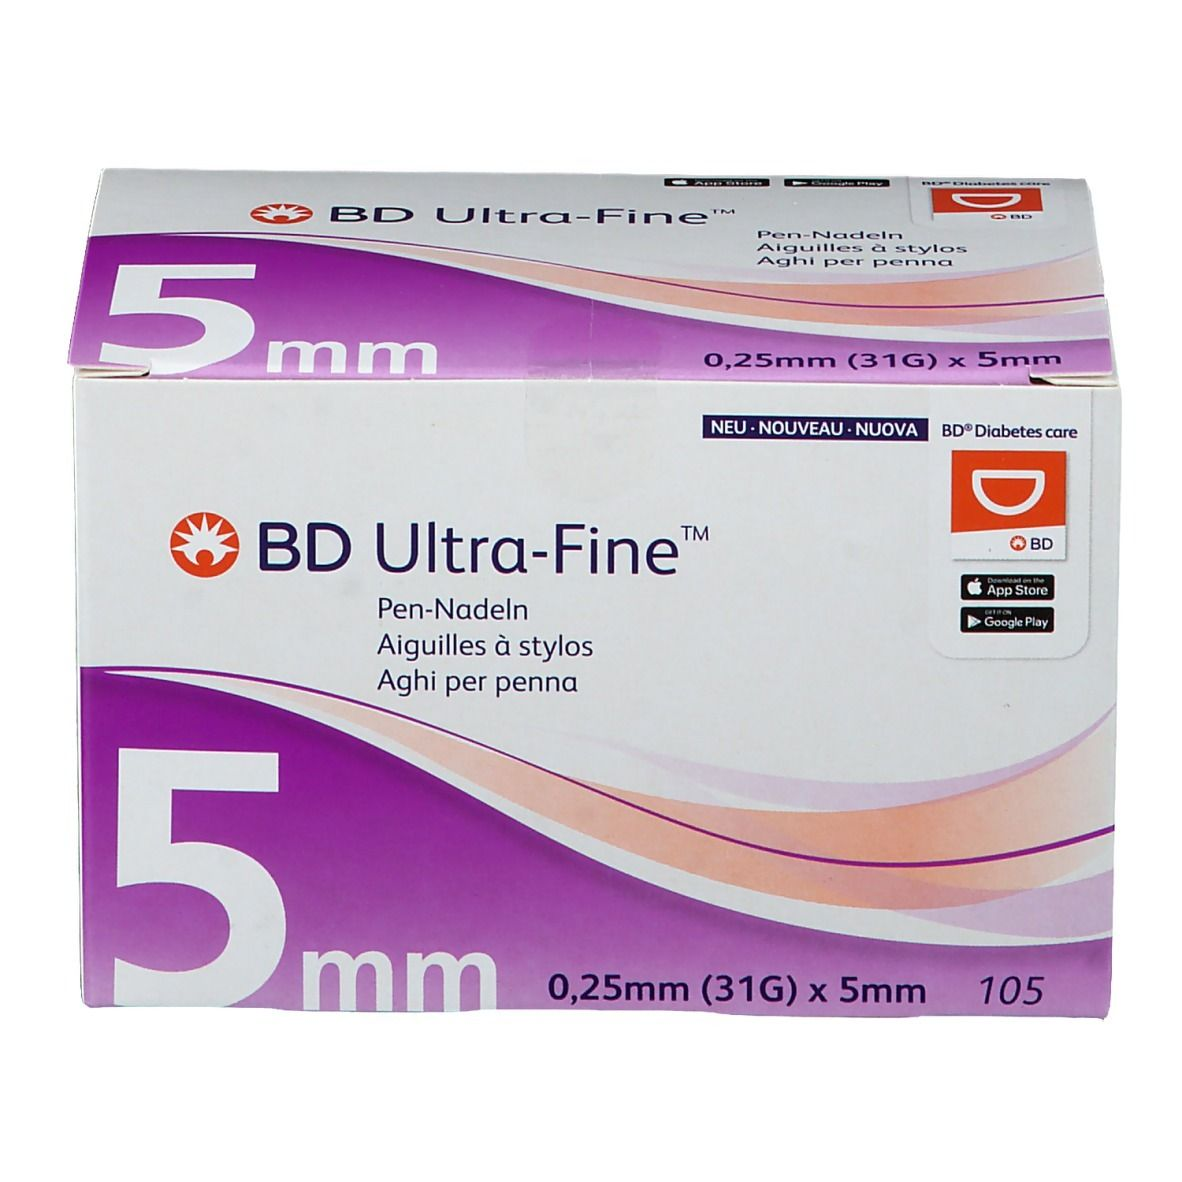 Image of BD Ultra-Fine™ 5 mm 31G x 5 mm